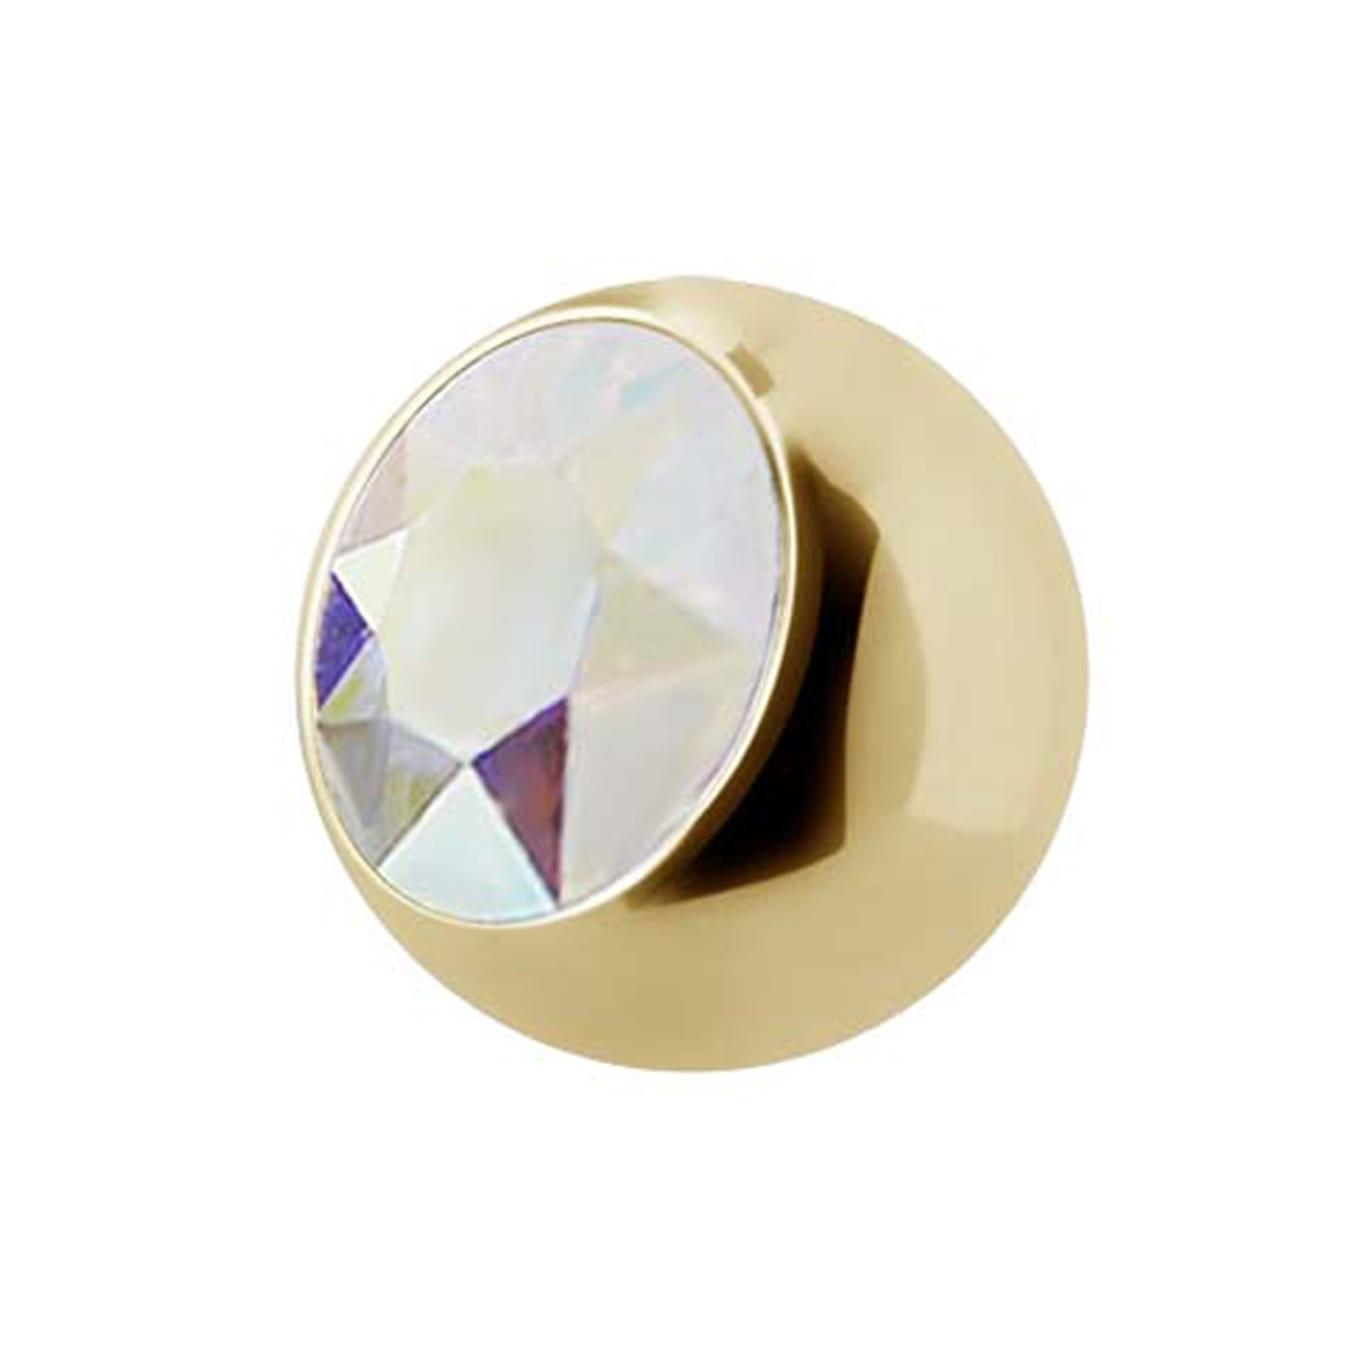 Extrakristall - 1,6 mm - Guld - Regnbågsskimrande kristall